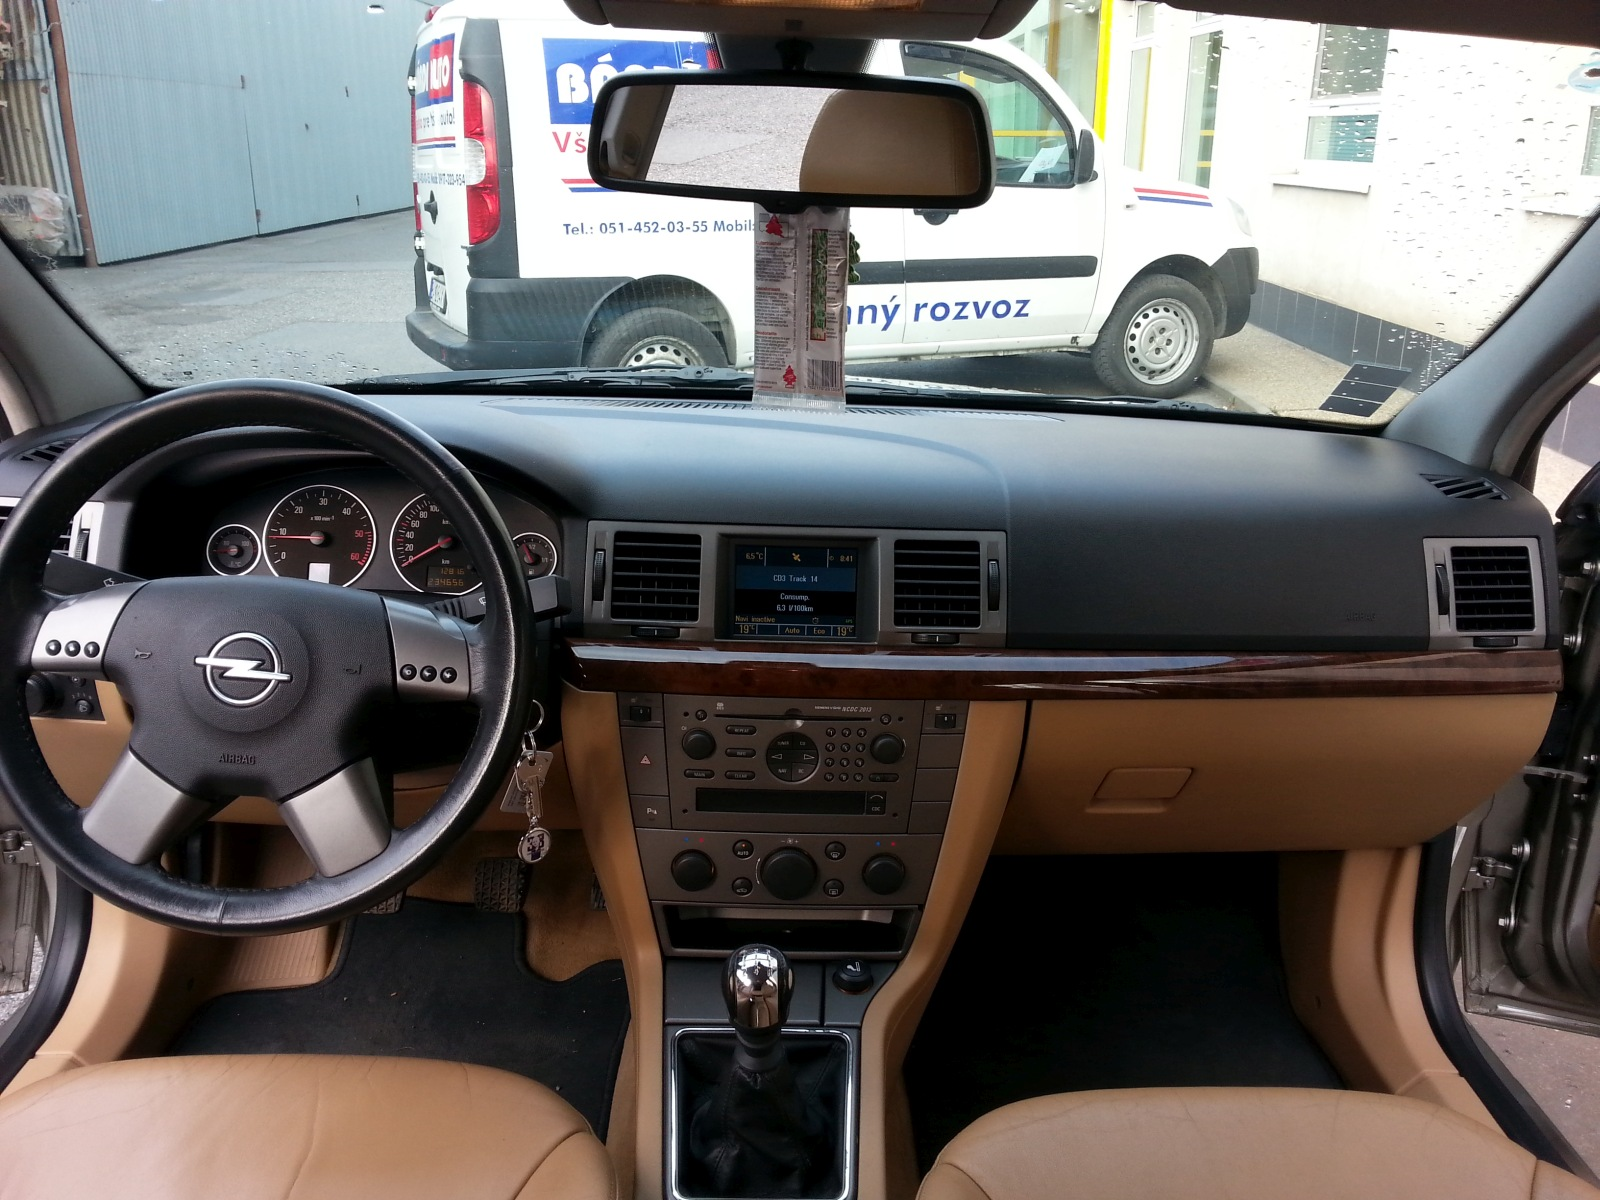 citatelska recenzia Opel Vectra Caravan 2,2DTi